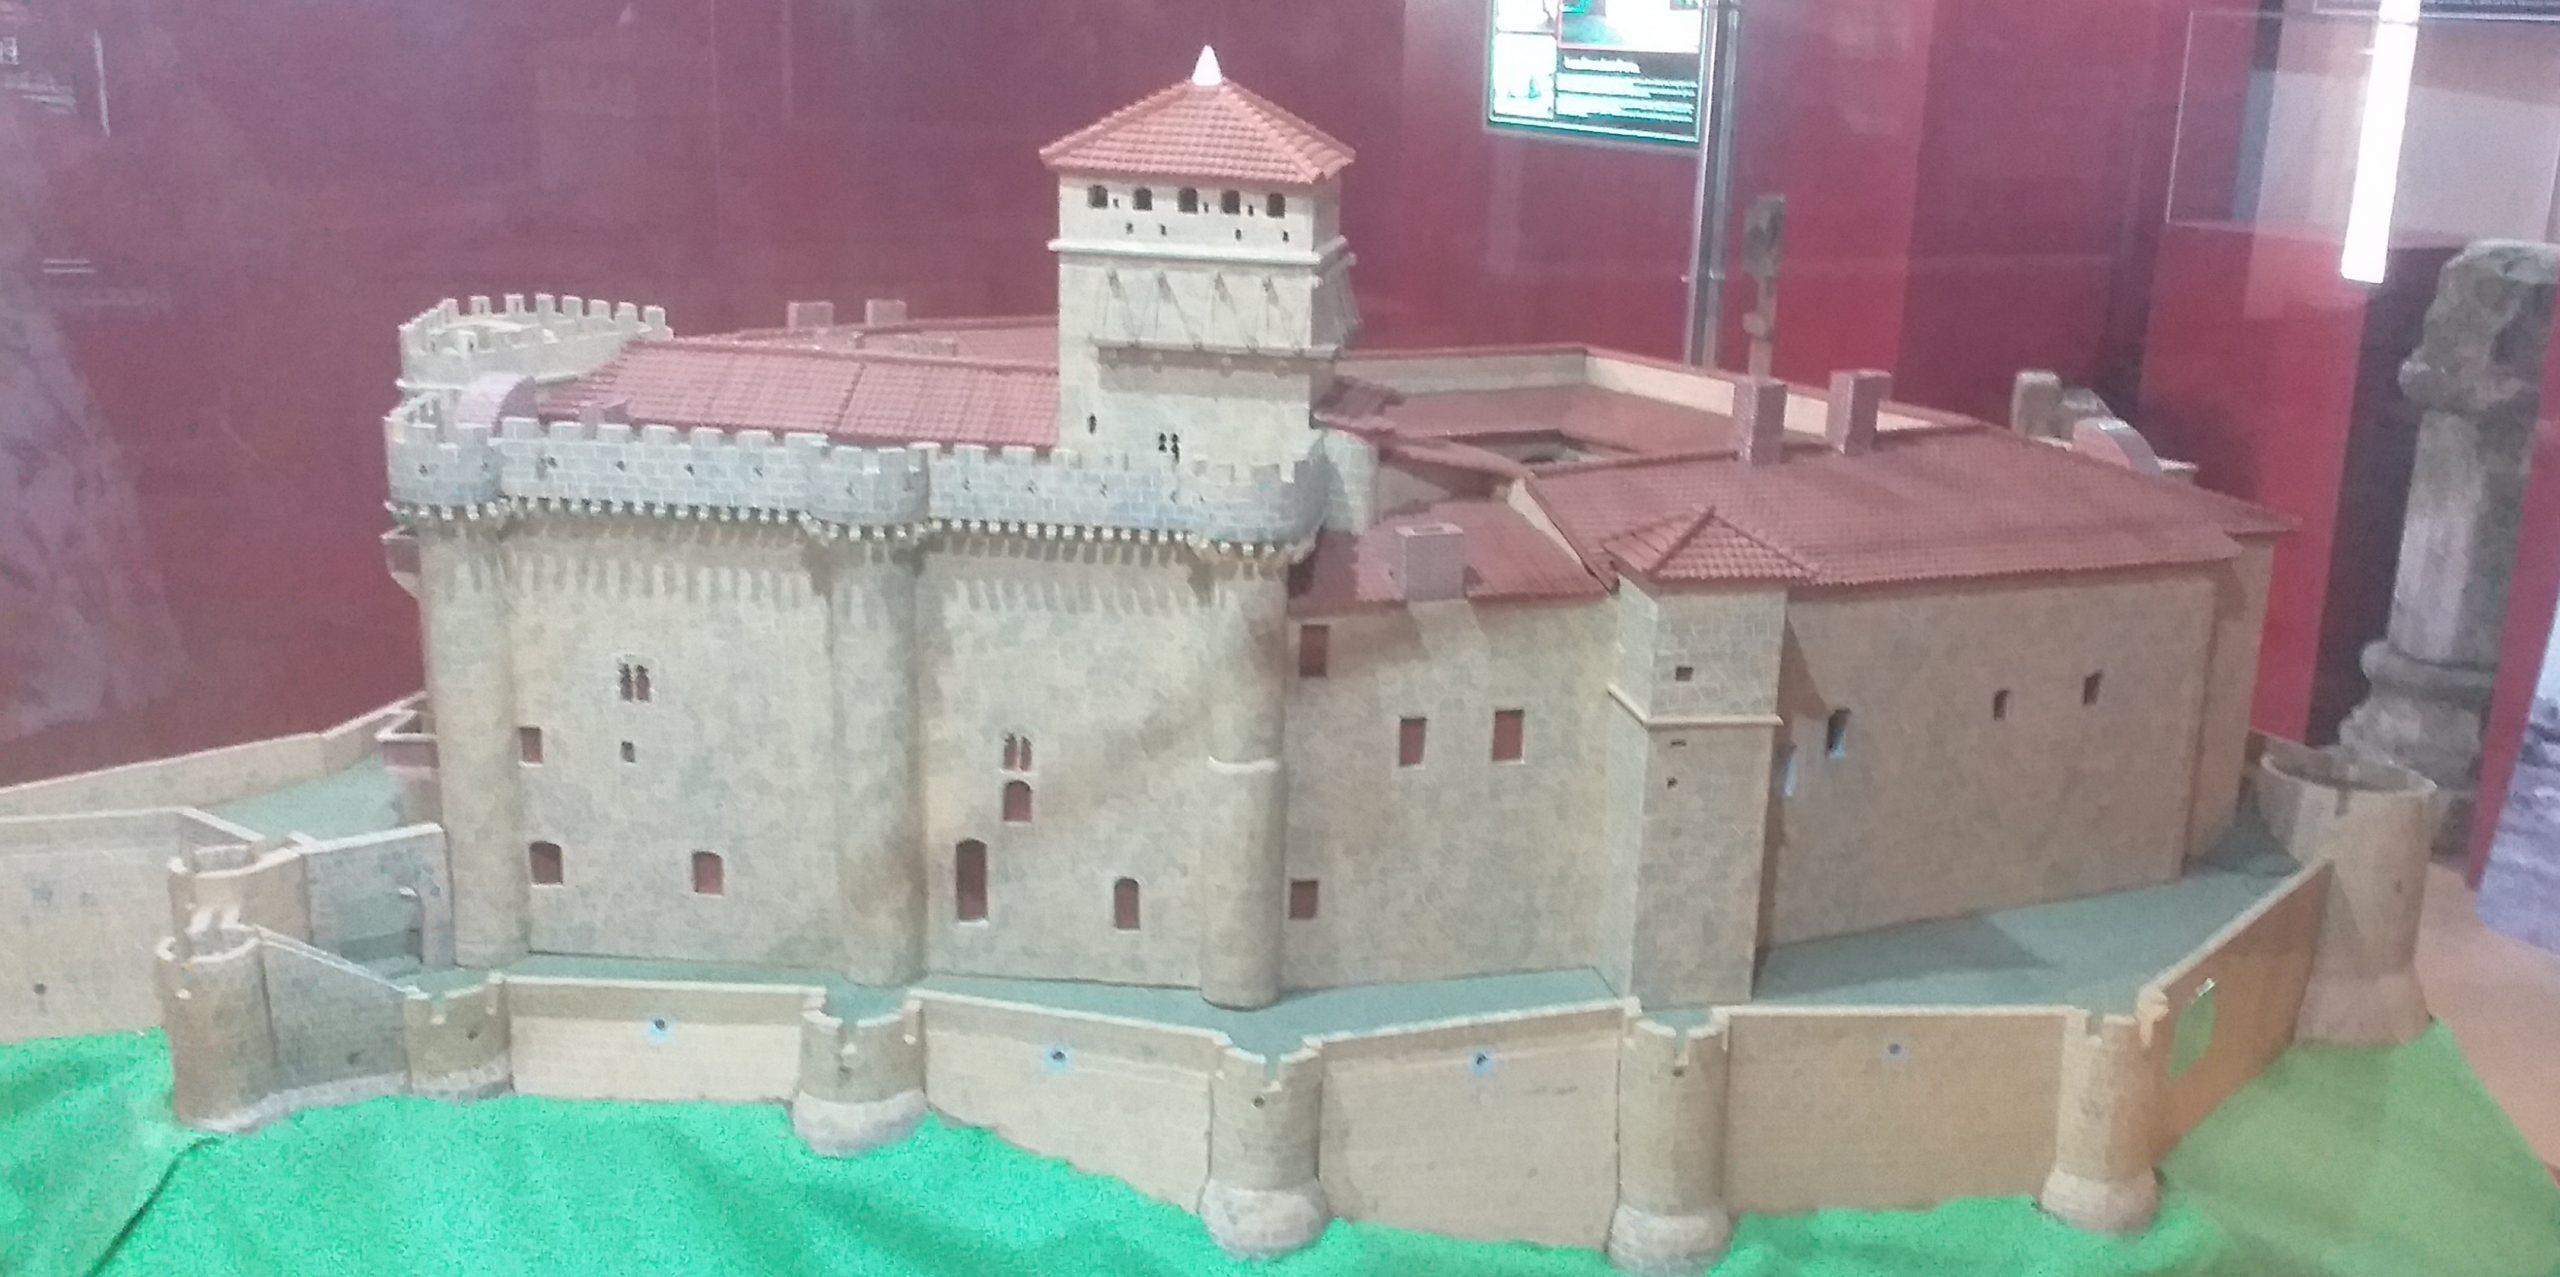 Maqueta Castillo Medieval Belvís de Monroy